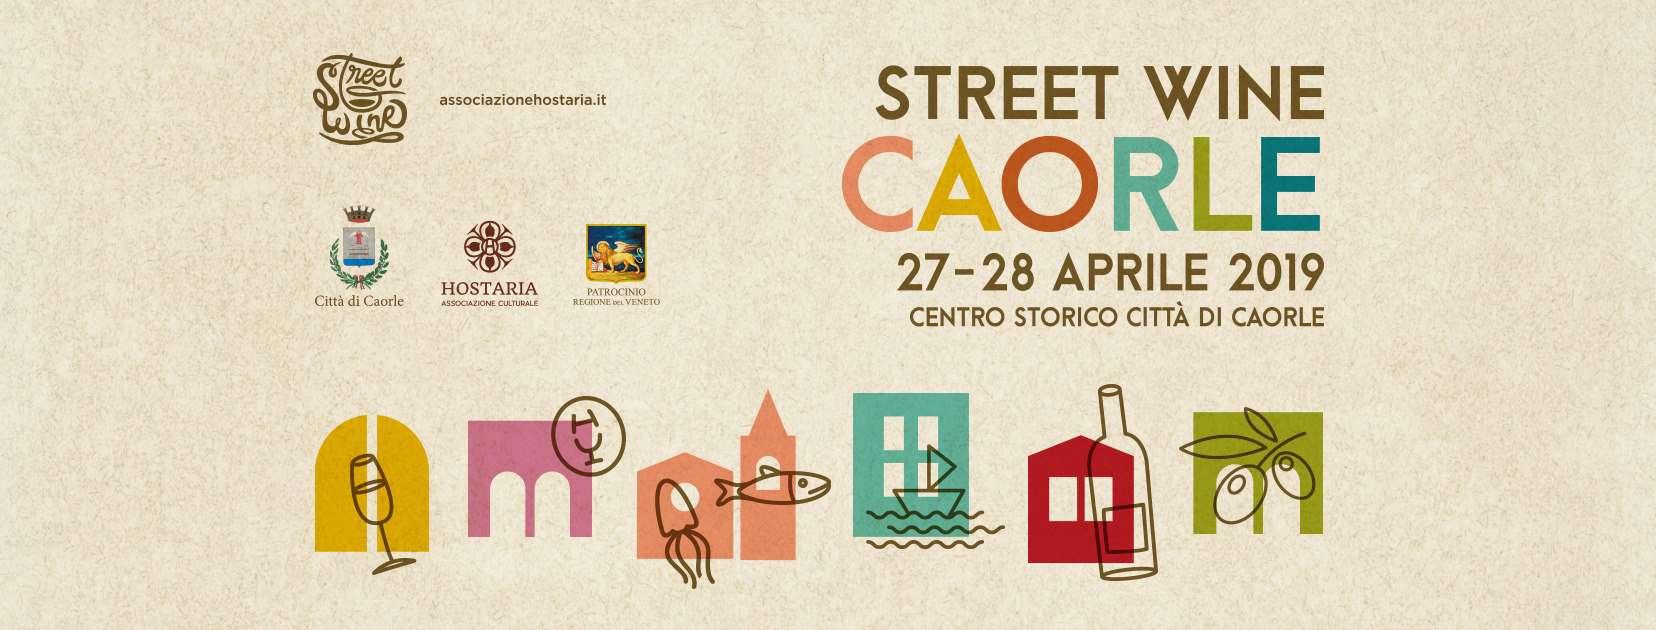 Street Wine Festival Caorle